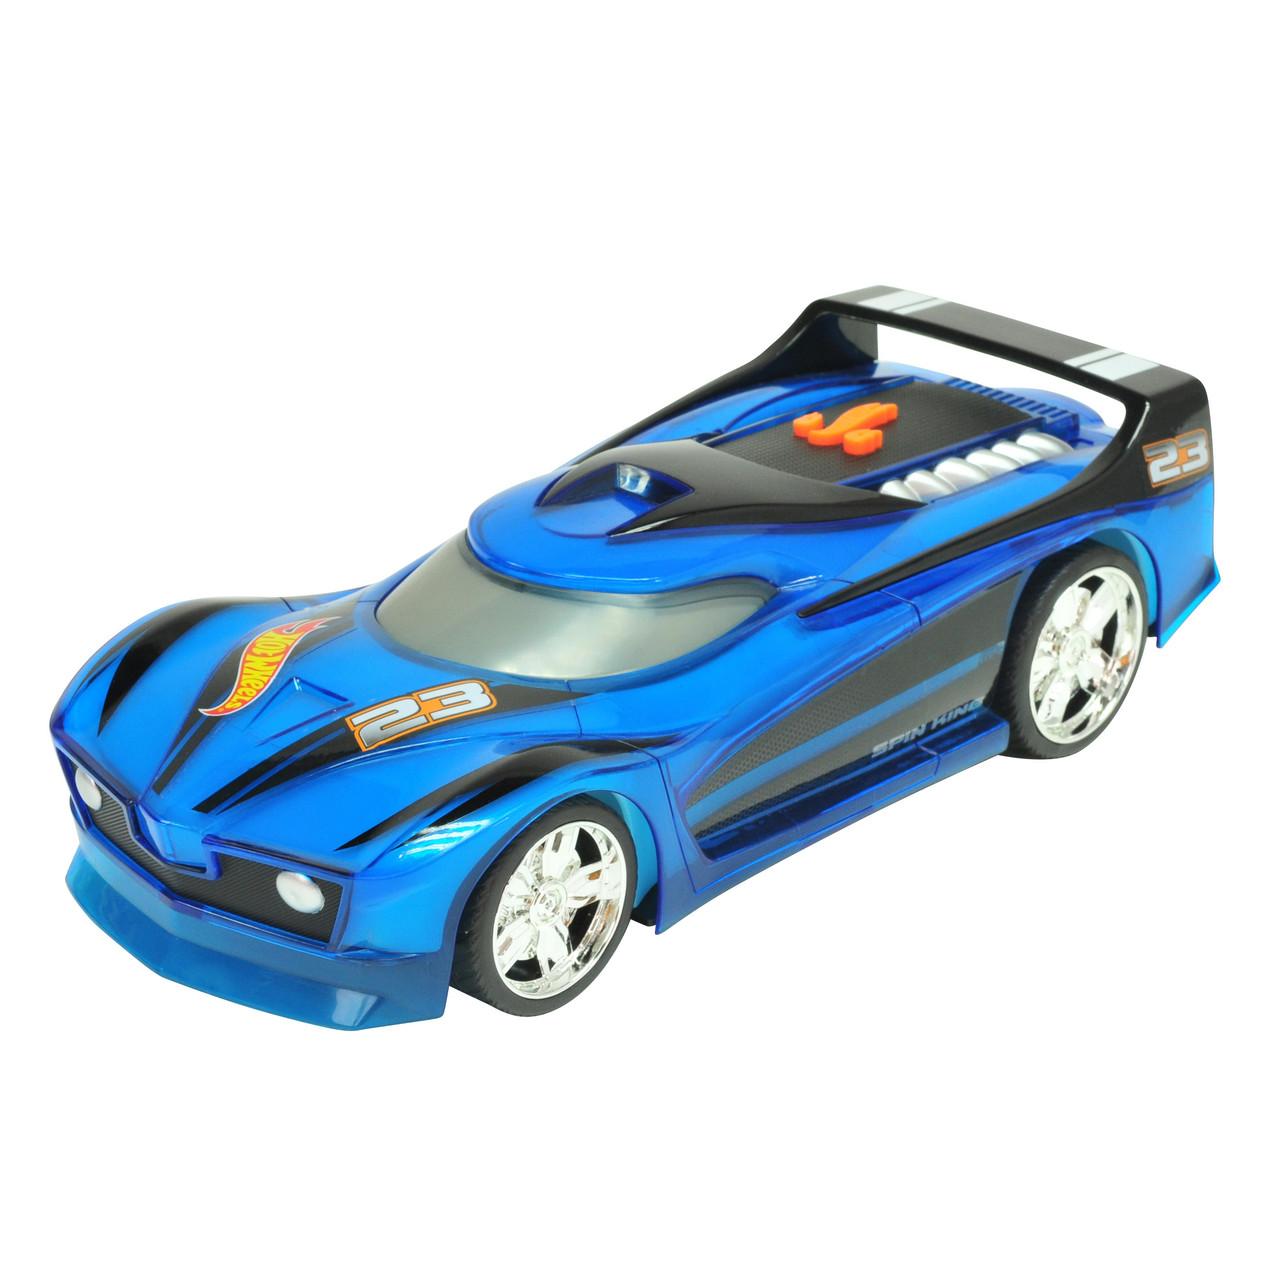 Супер гонщик Spin King, 25 см «Toy State» (90532)